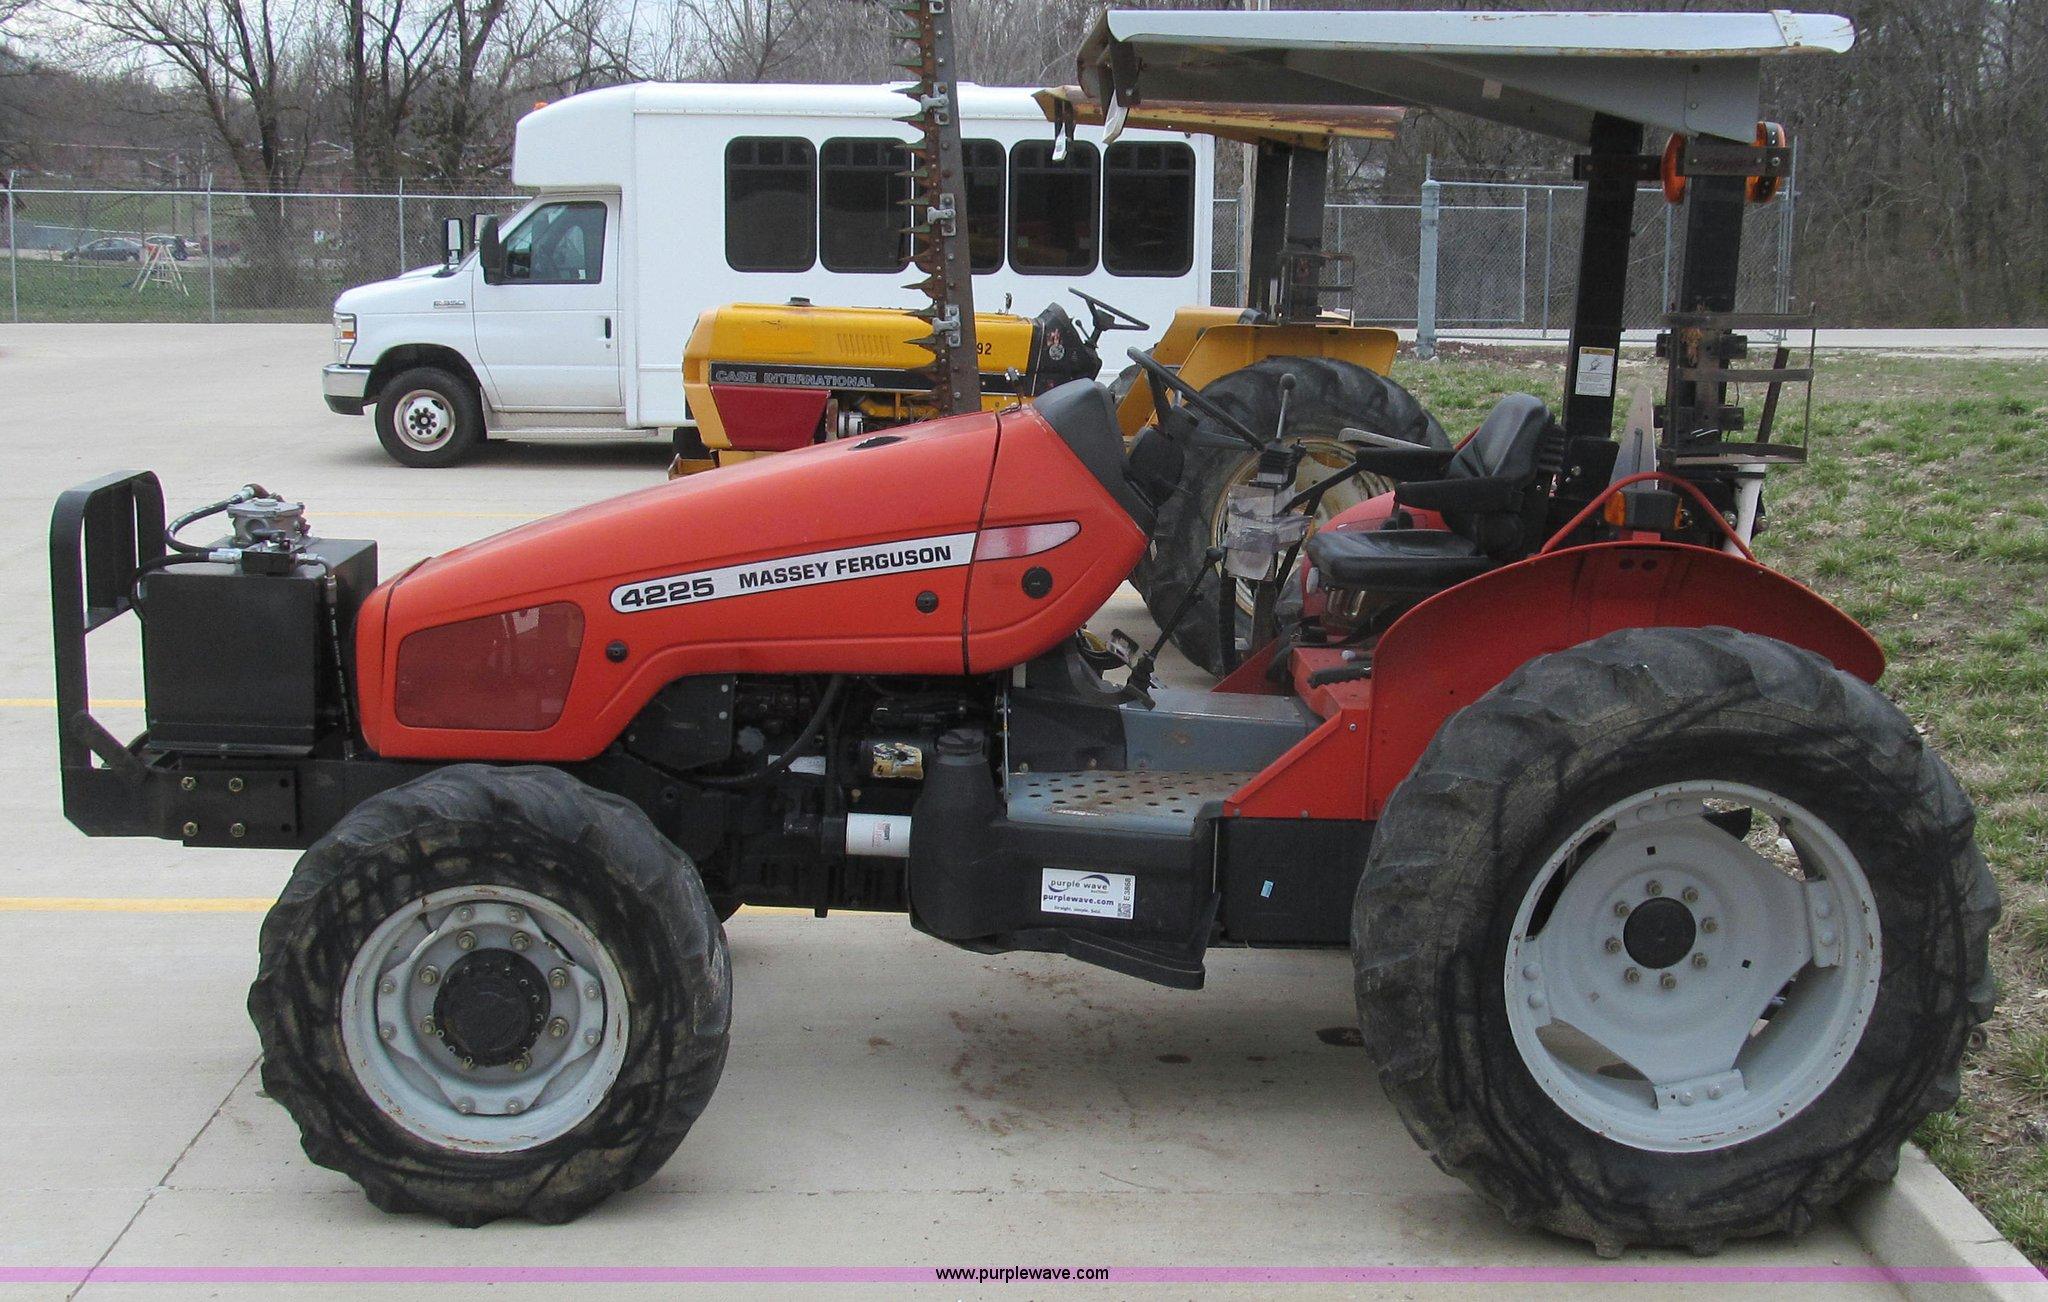 2000 massey ferguson 4225 mfwd tractor item e3868 sold rh purplewave com Massey Ferguson 1533 Hydraulic System massey ferguson 4225 workshop manual